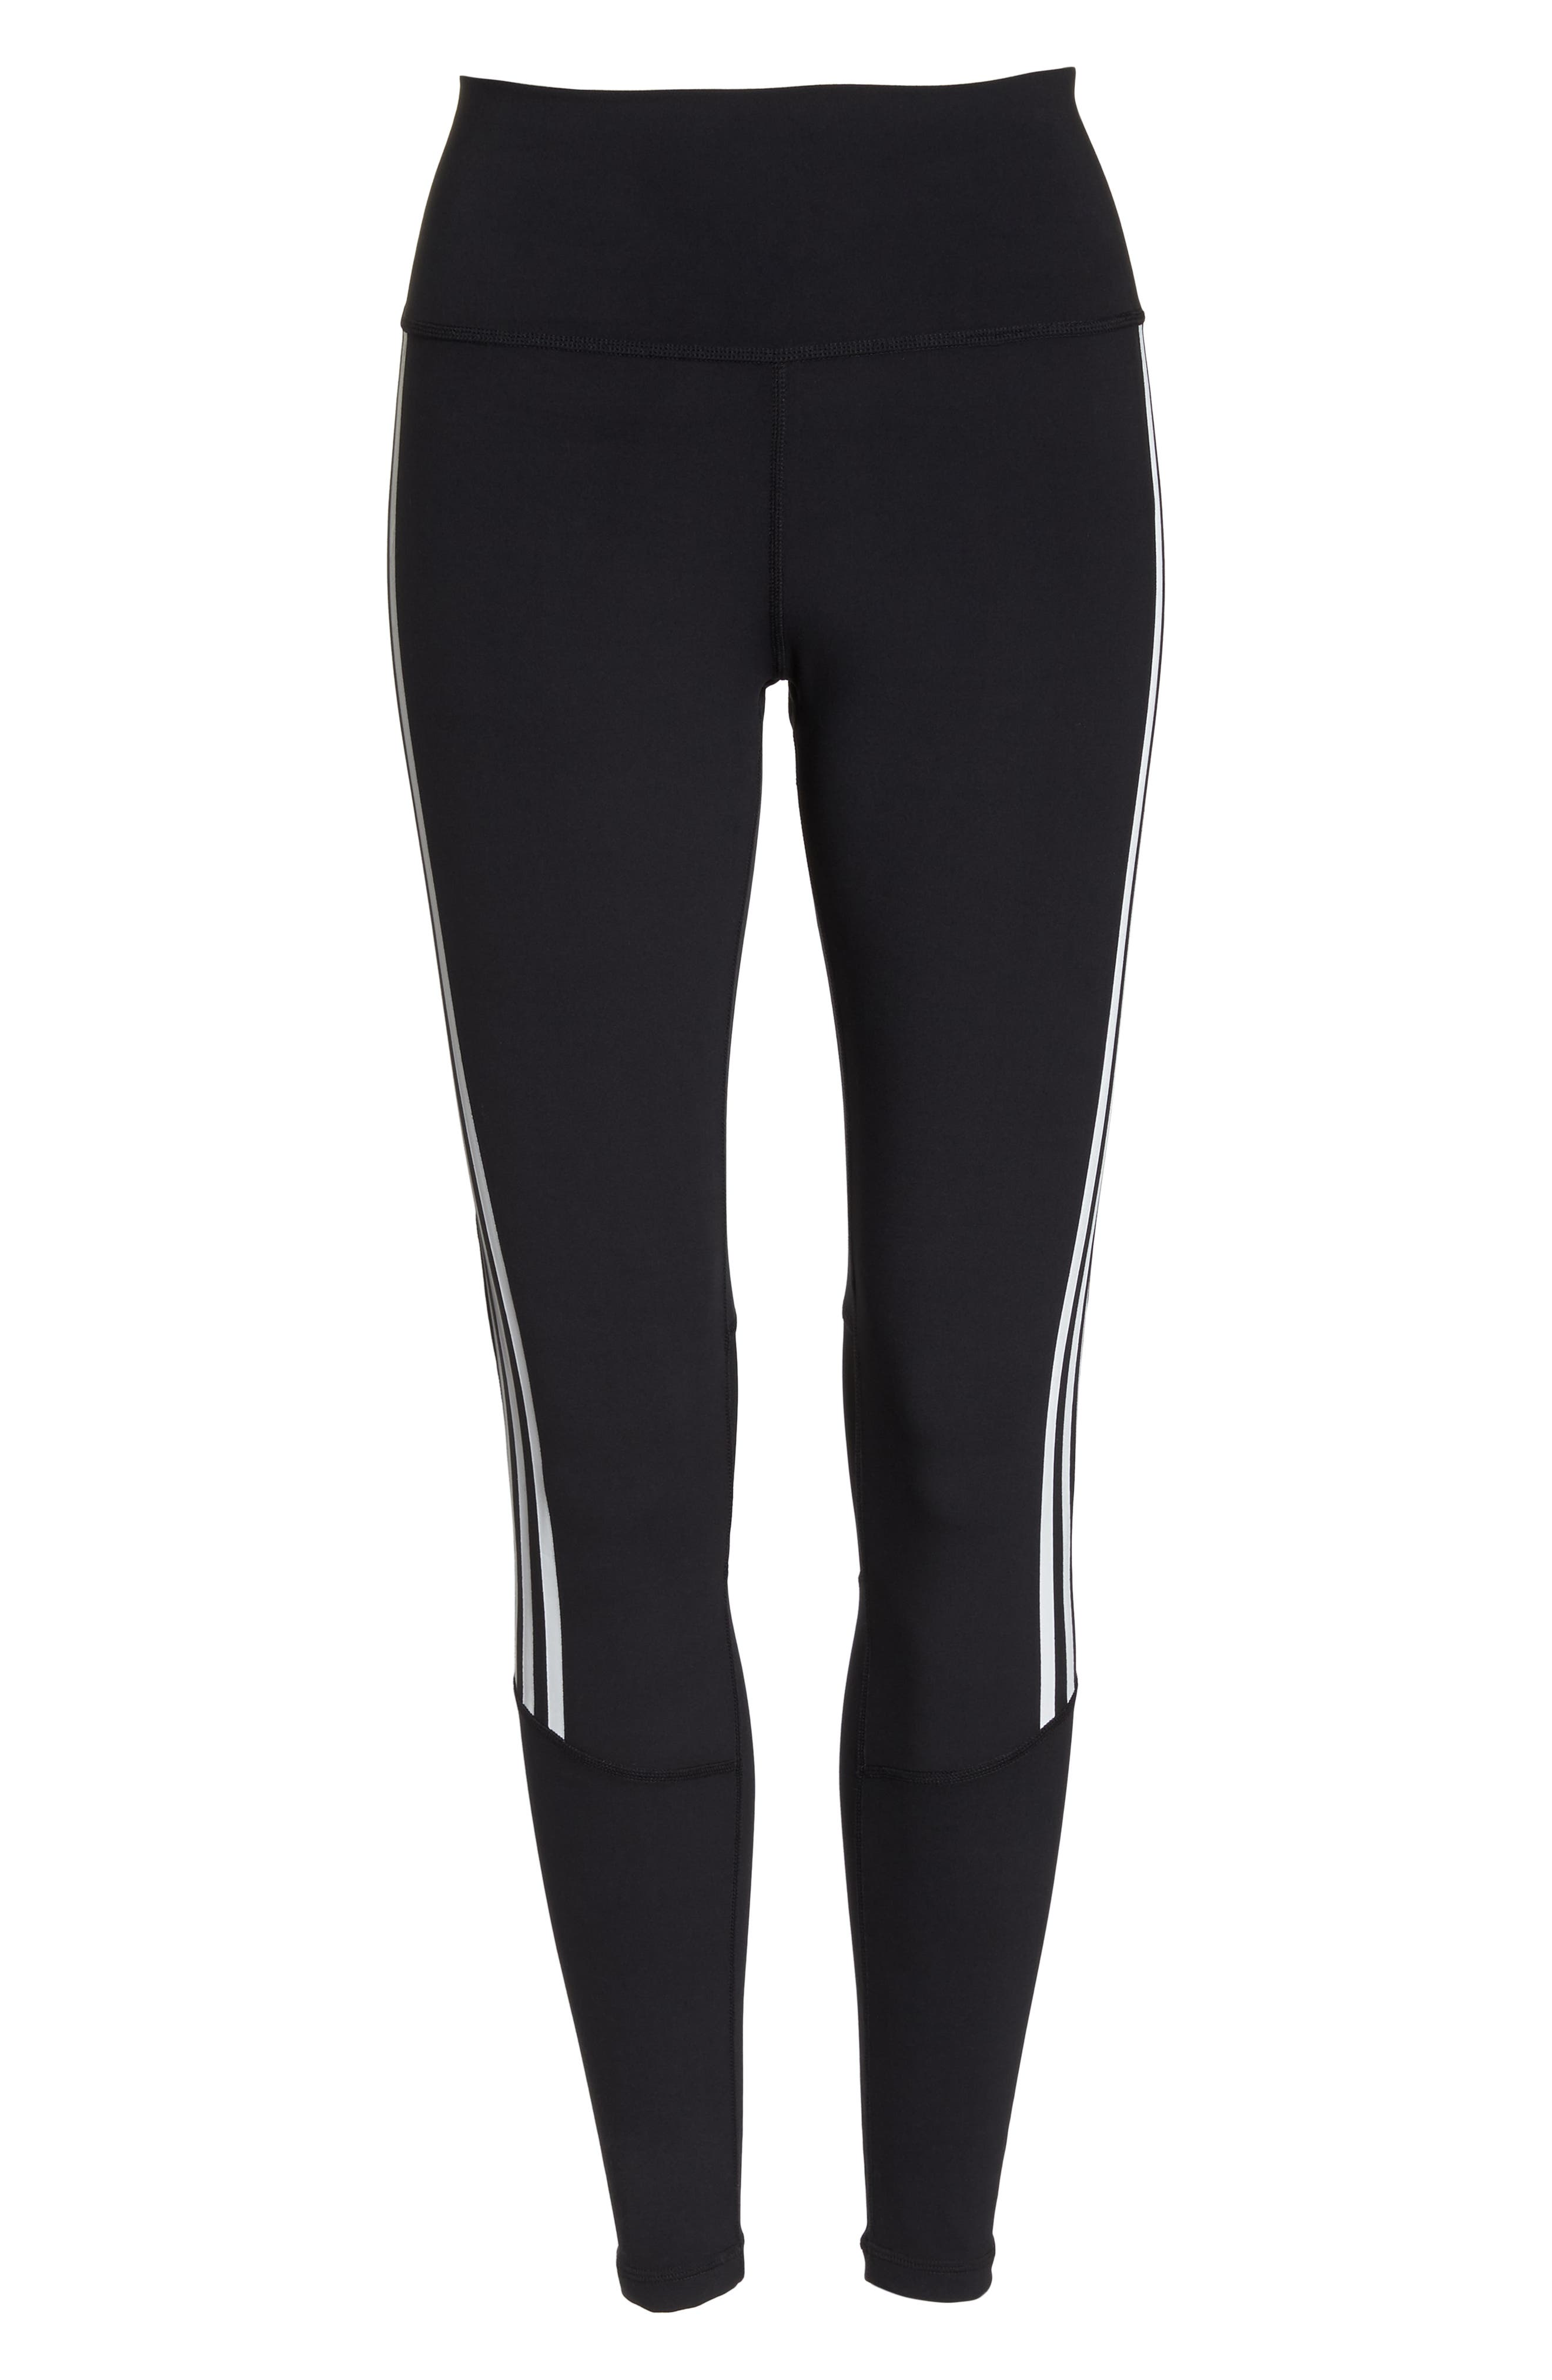 Believe This 3-Stripes High Waist Ankle Leggings,                             Alternate thumbnail 7, color,                             BLACK/ WHITE